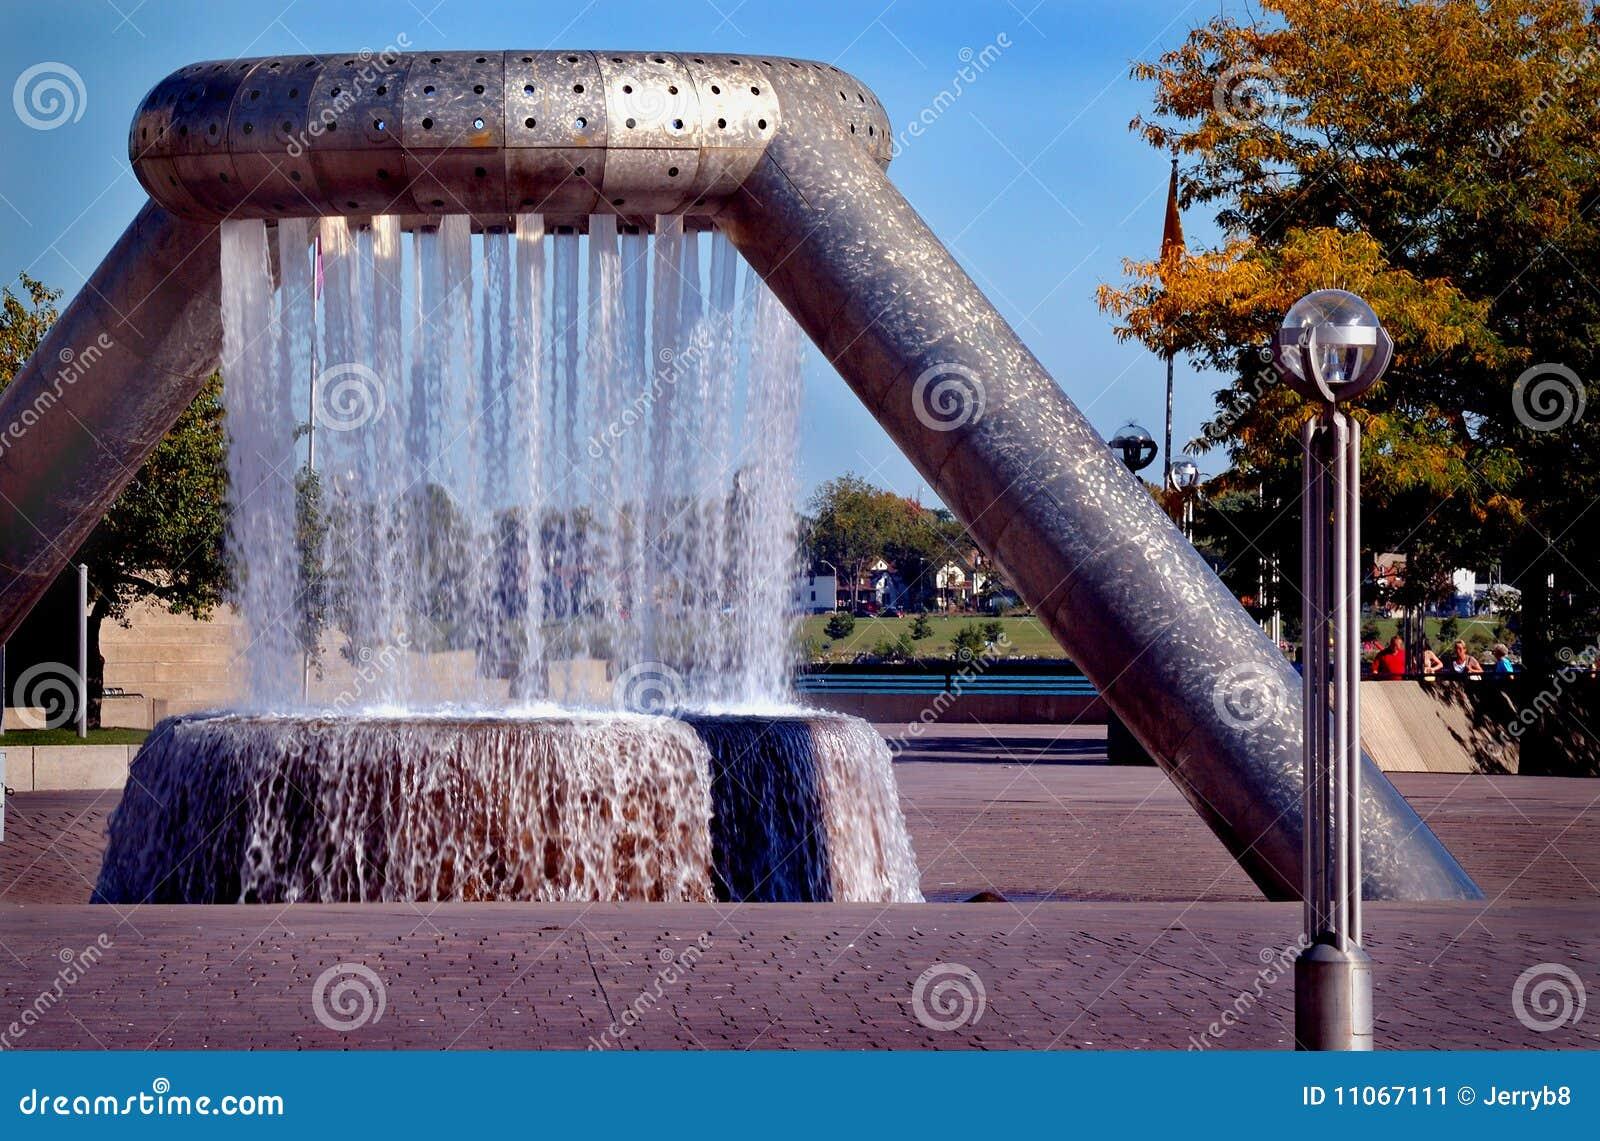 fuente de agua decorativa imagen de archivo